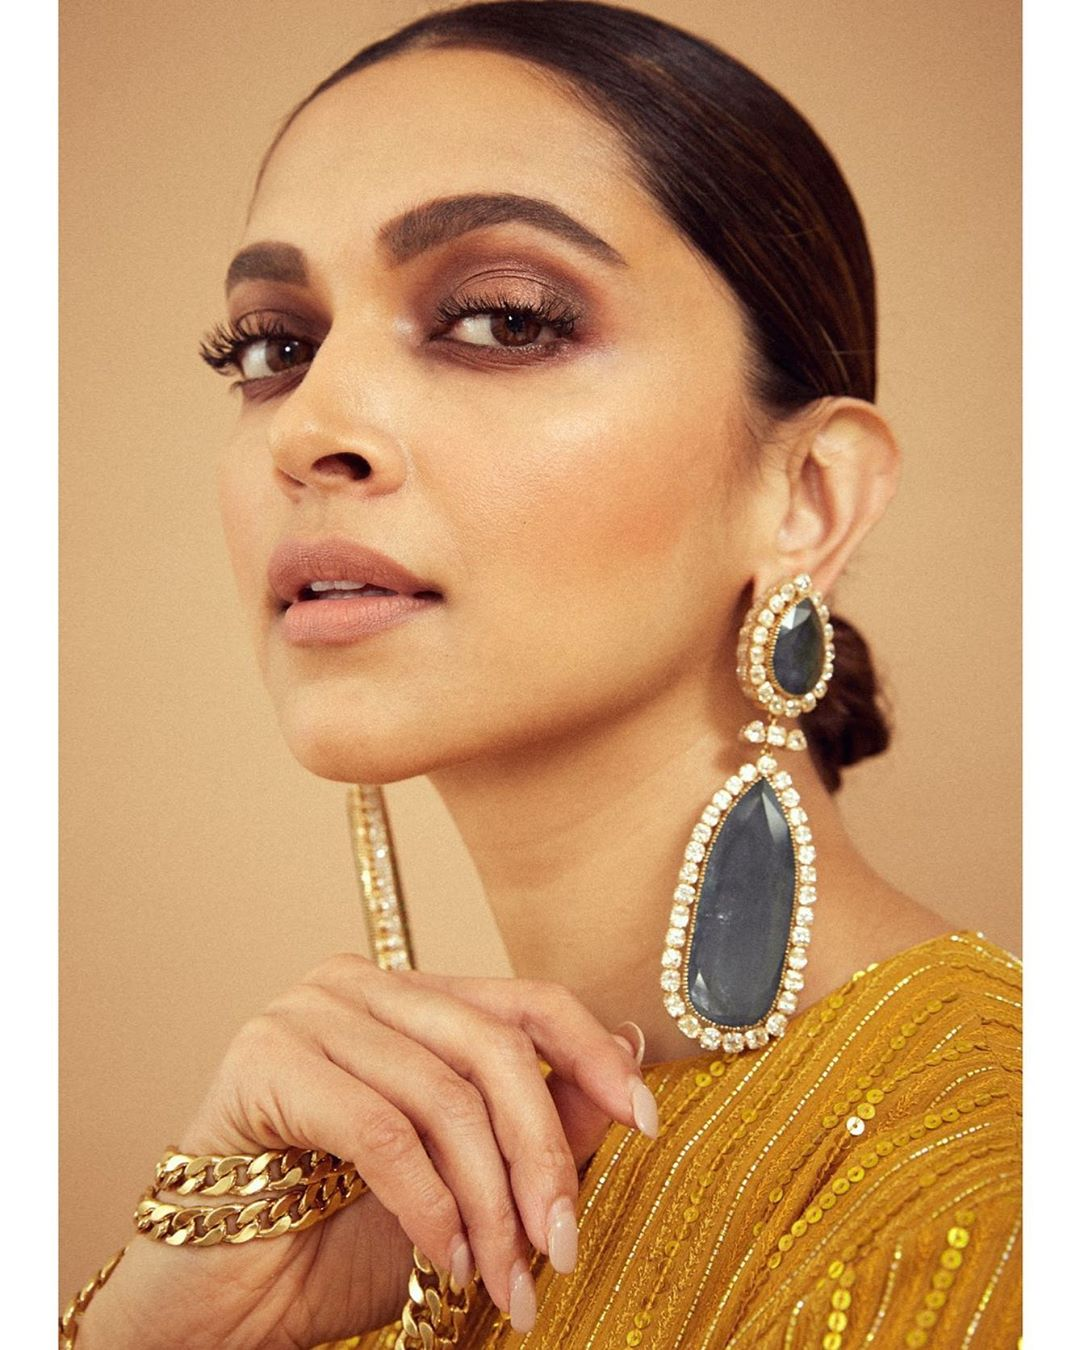 Deepika Padukone's Love Affair With Saris